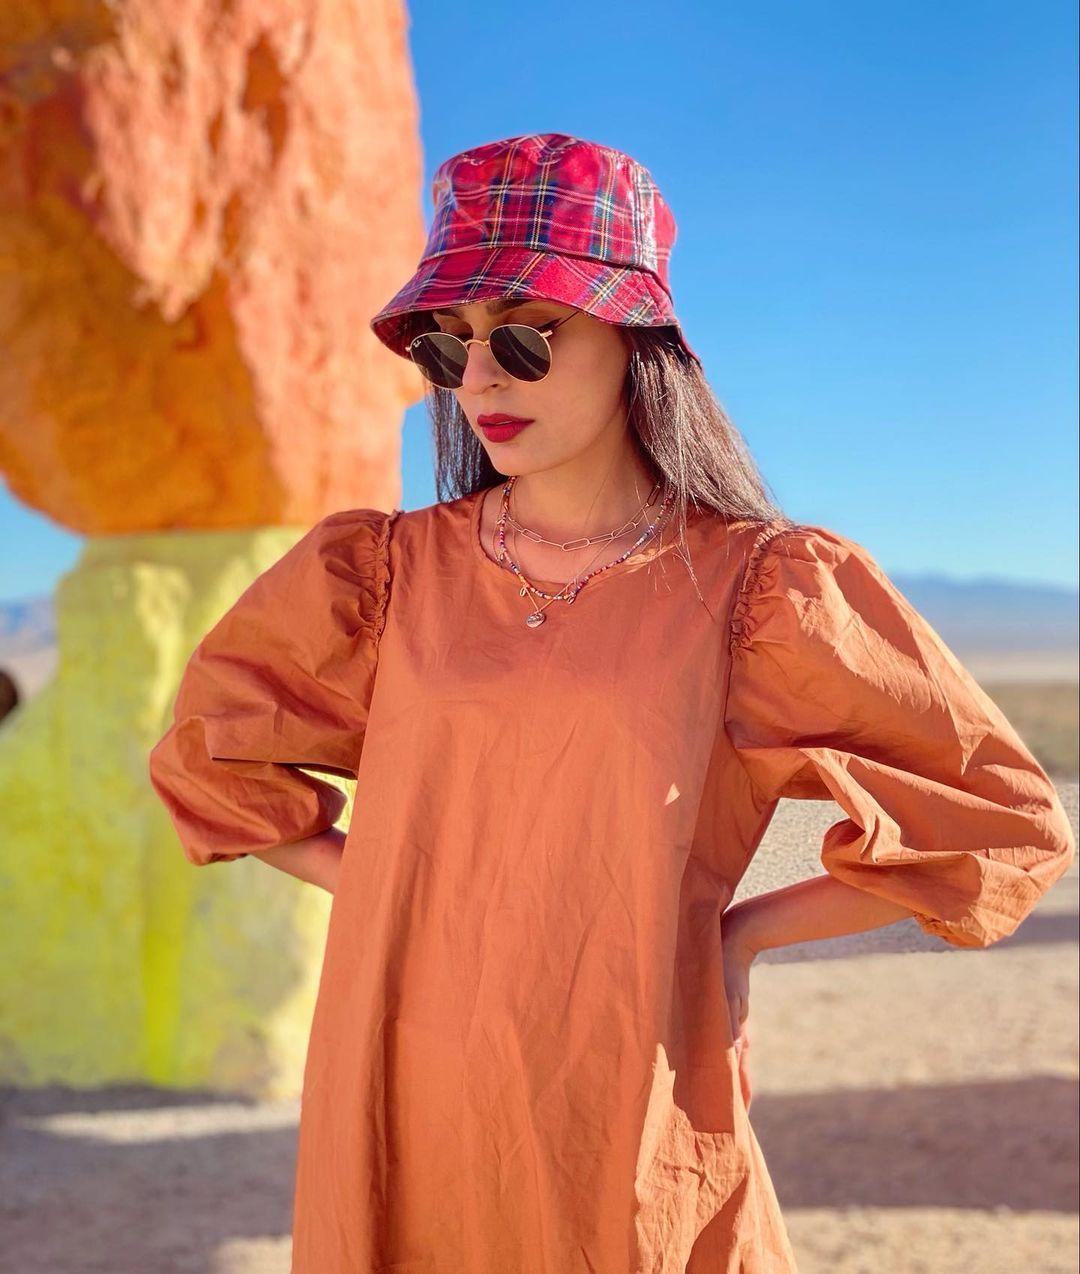 Sadia Ghaffar is Looking Stunning in her Latest Clicks